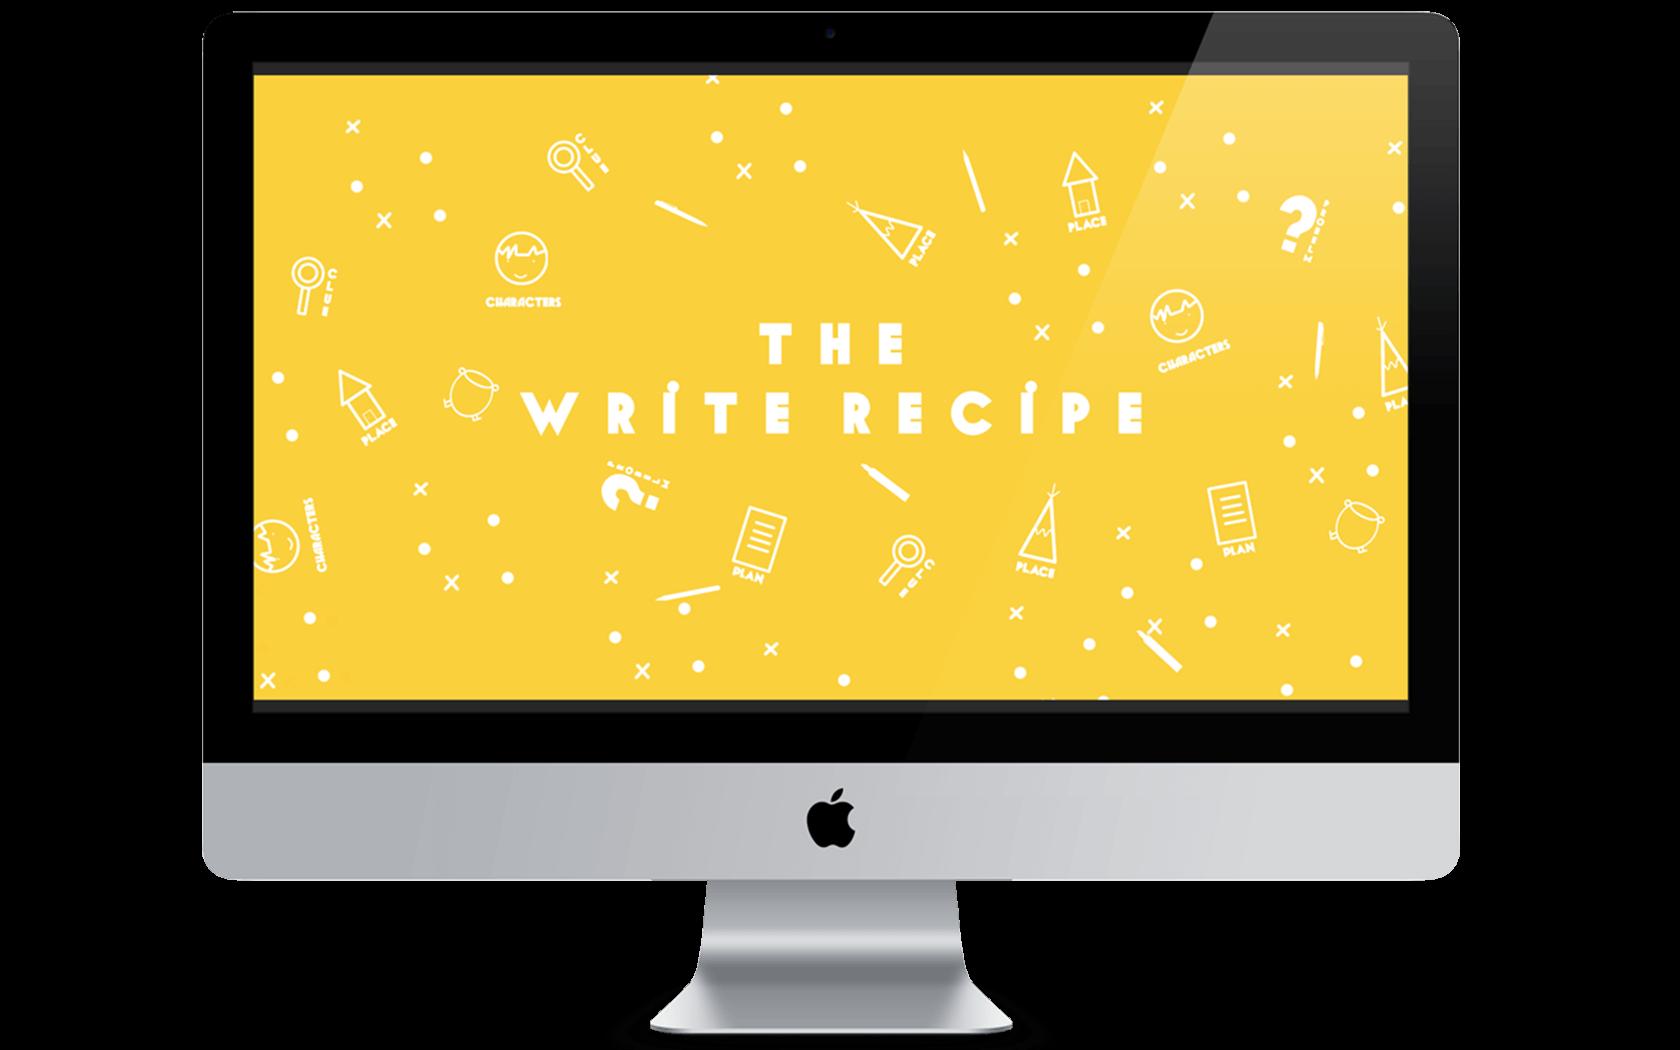 The Write Recipe: Creative Writing Course